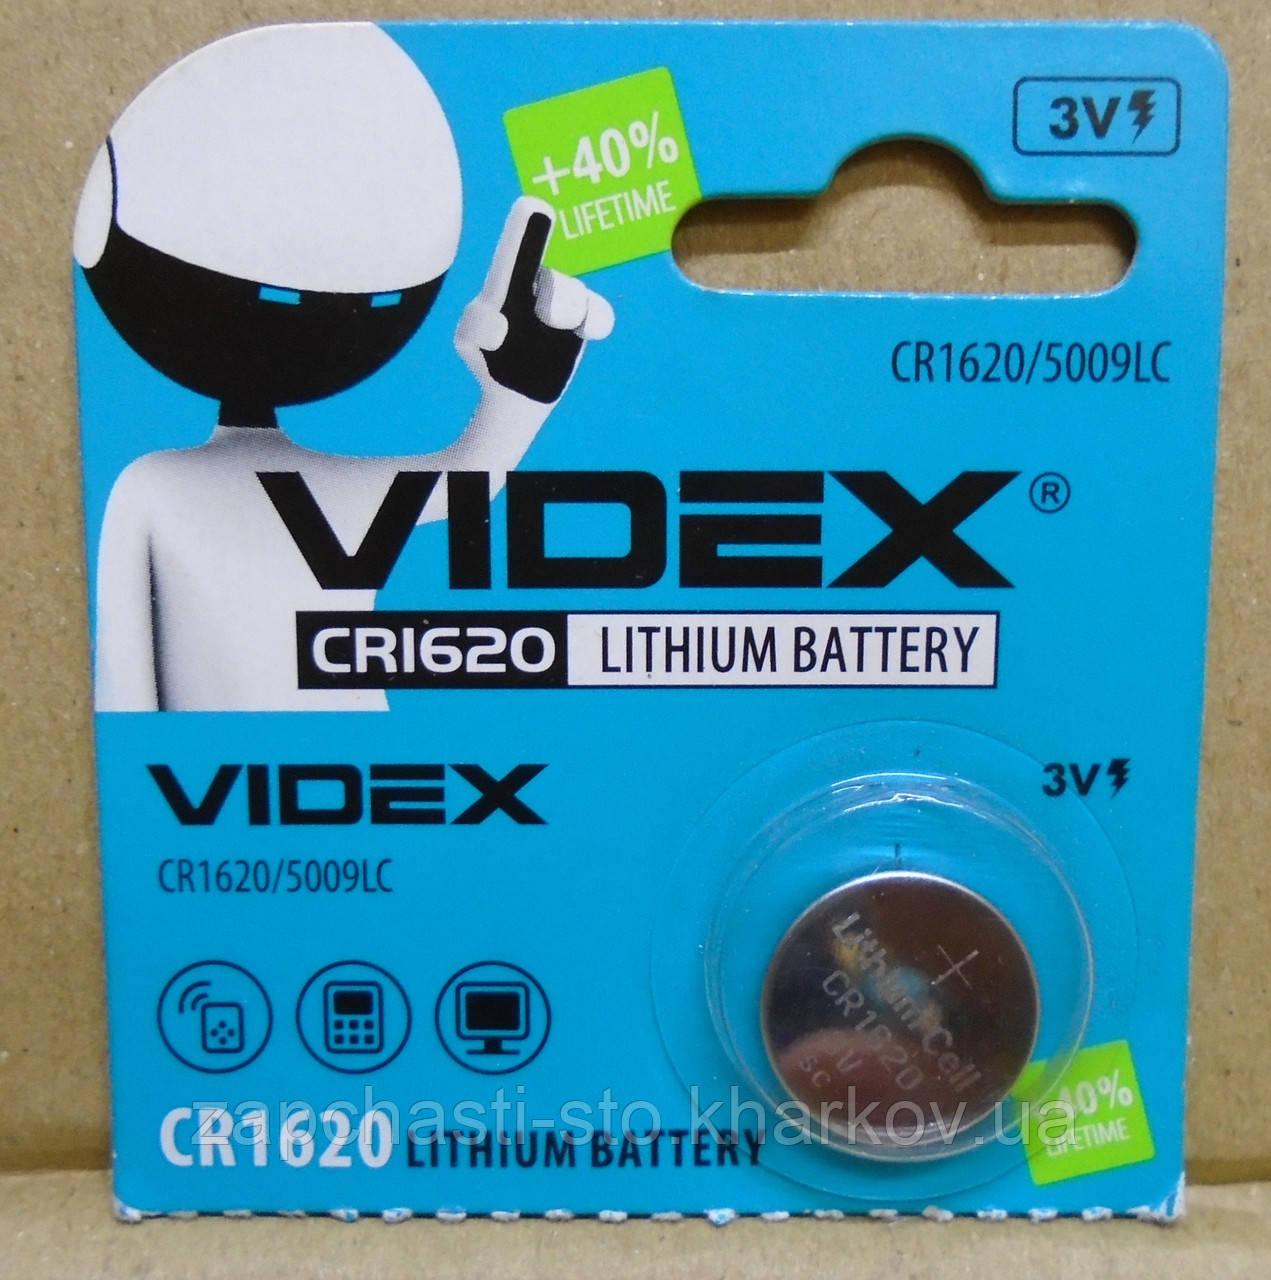 Батарейка брелка, пульта автосигнализации Videx CR1620 (+40%)